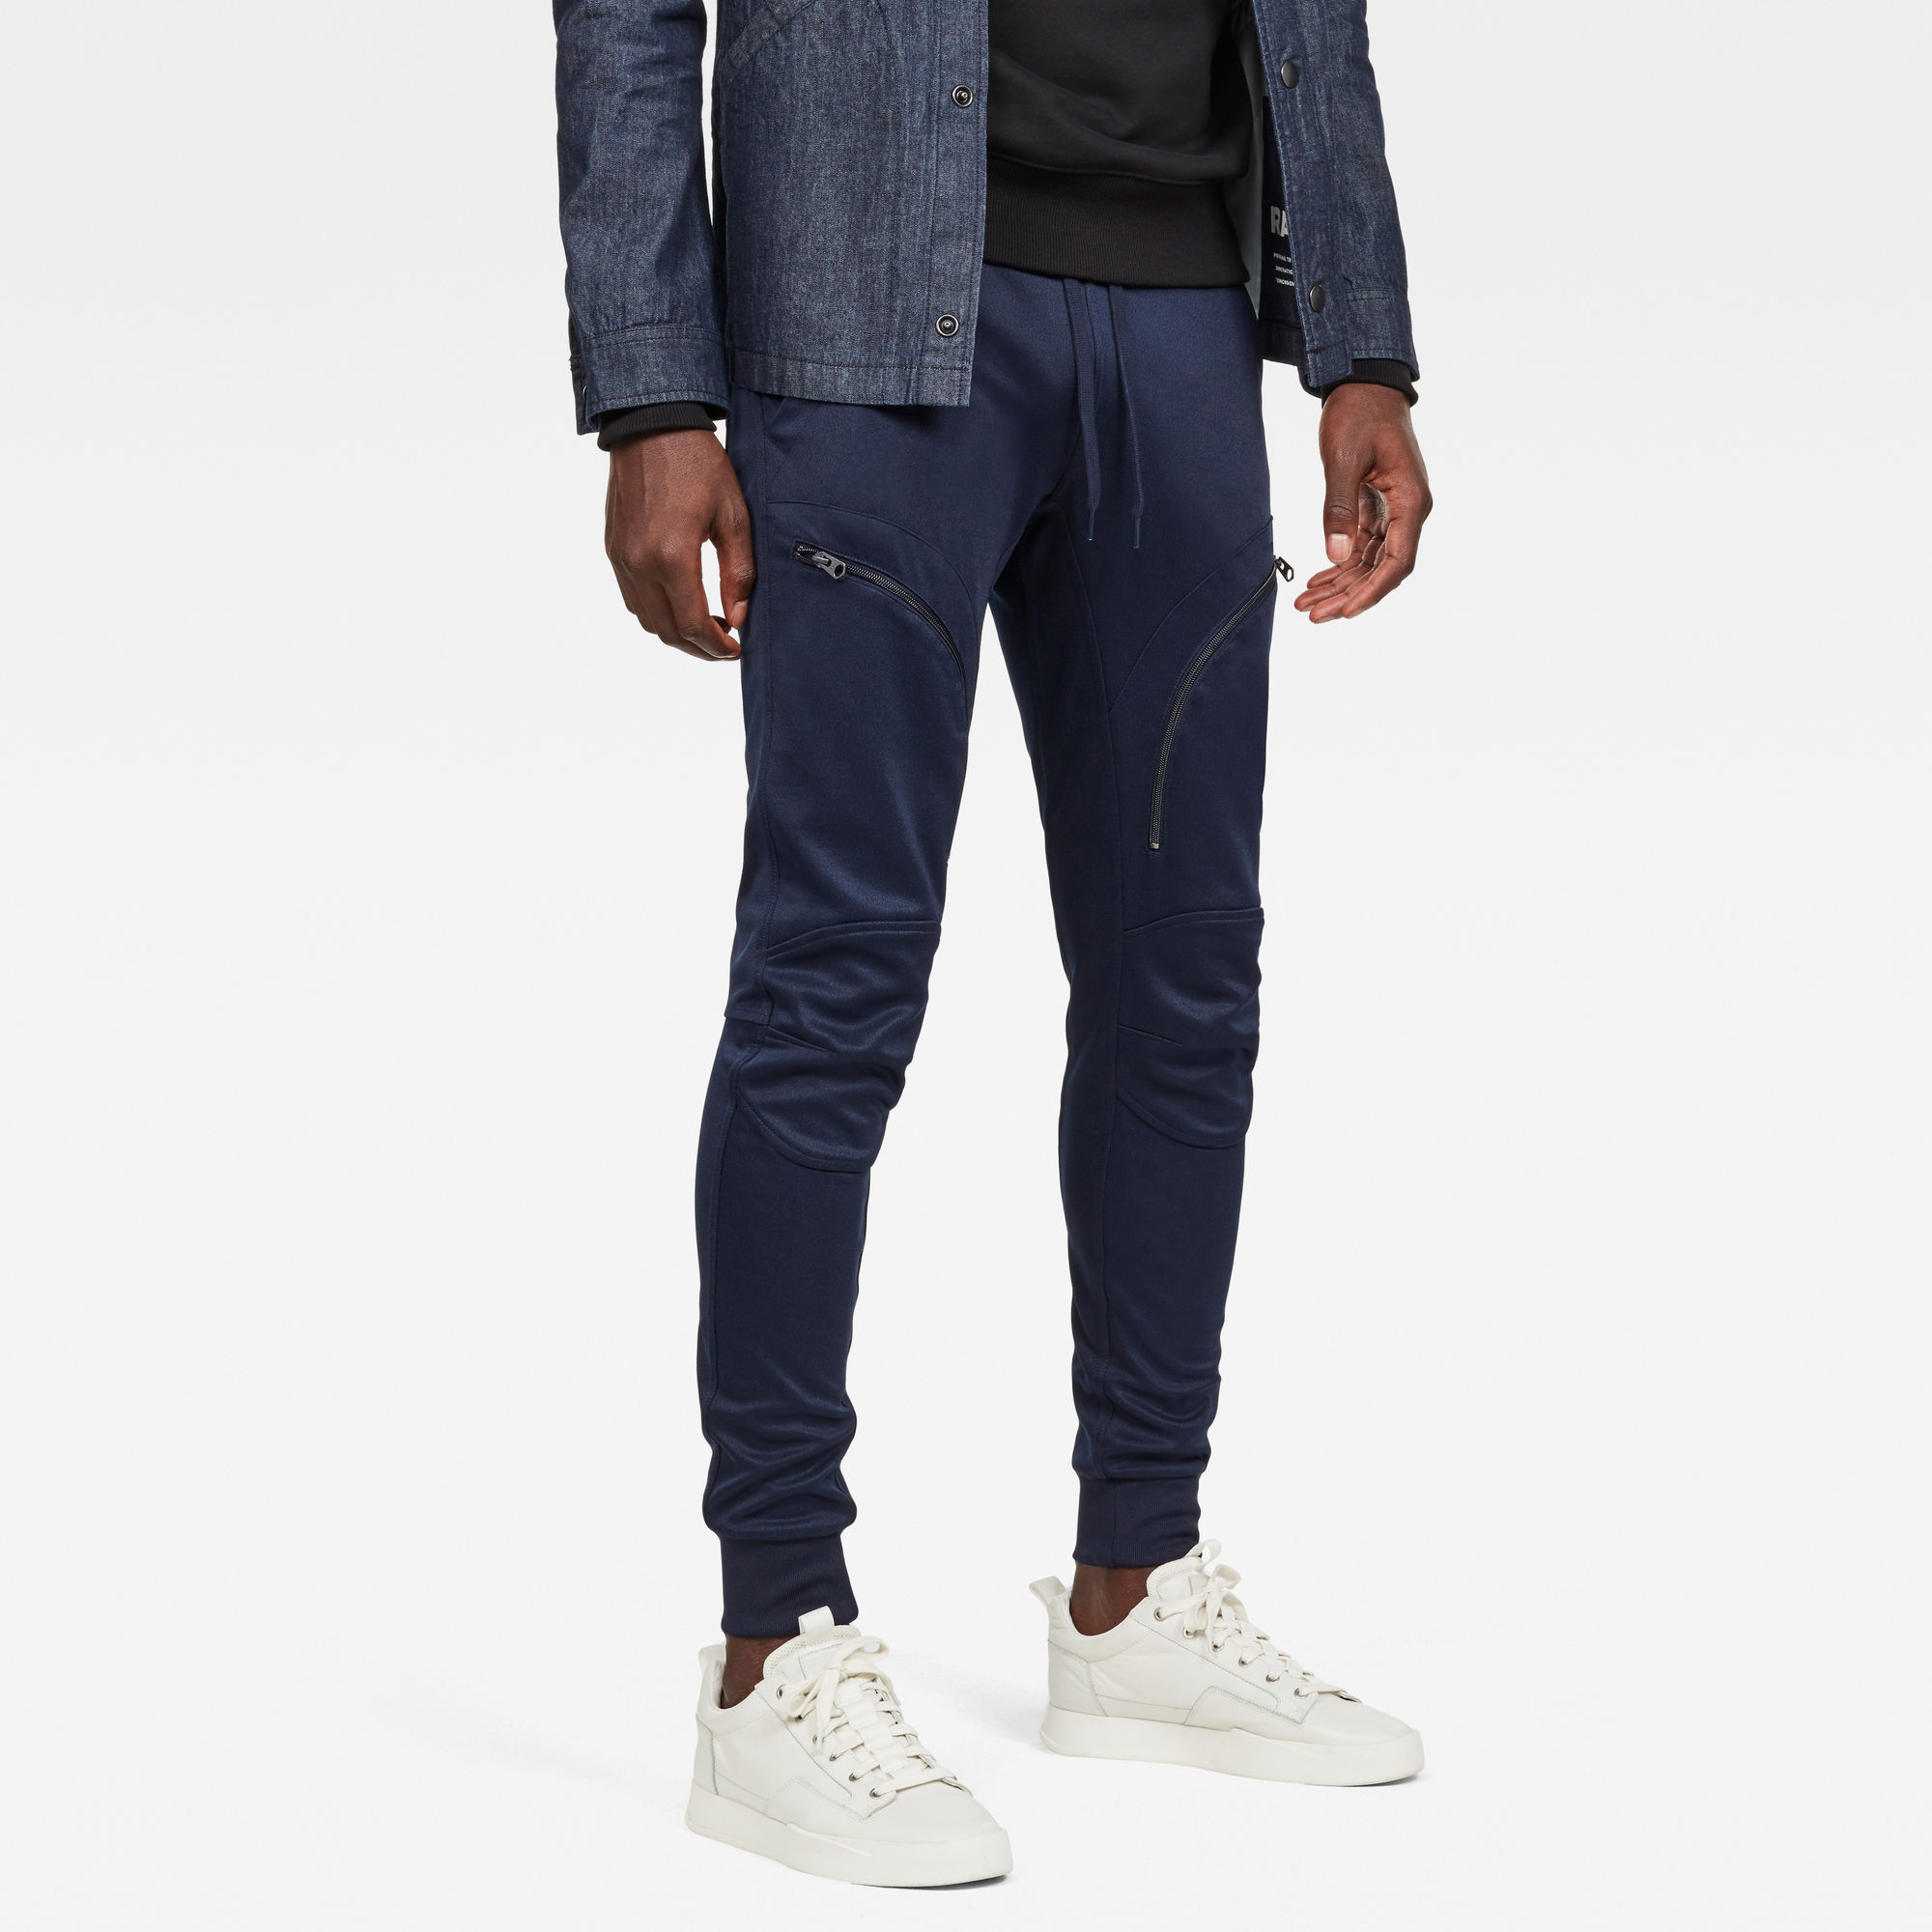 G-Star RAW Heren Air Defence Zip 3D Slim Sweatpants Donkerblauw